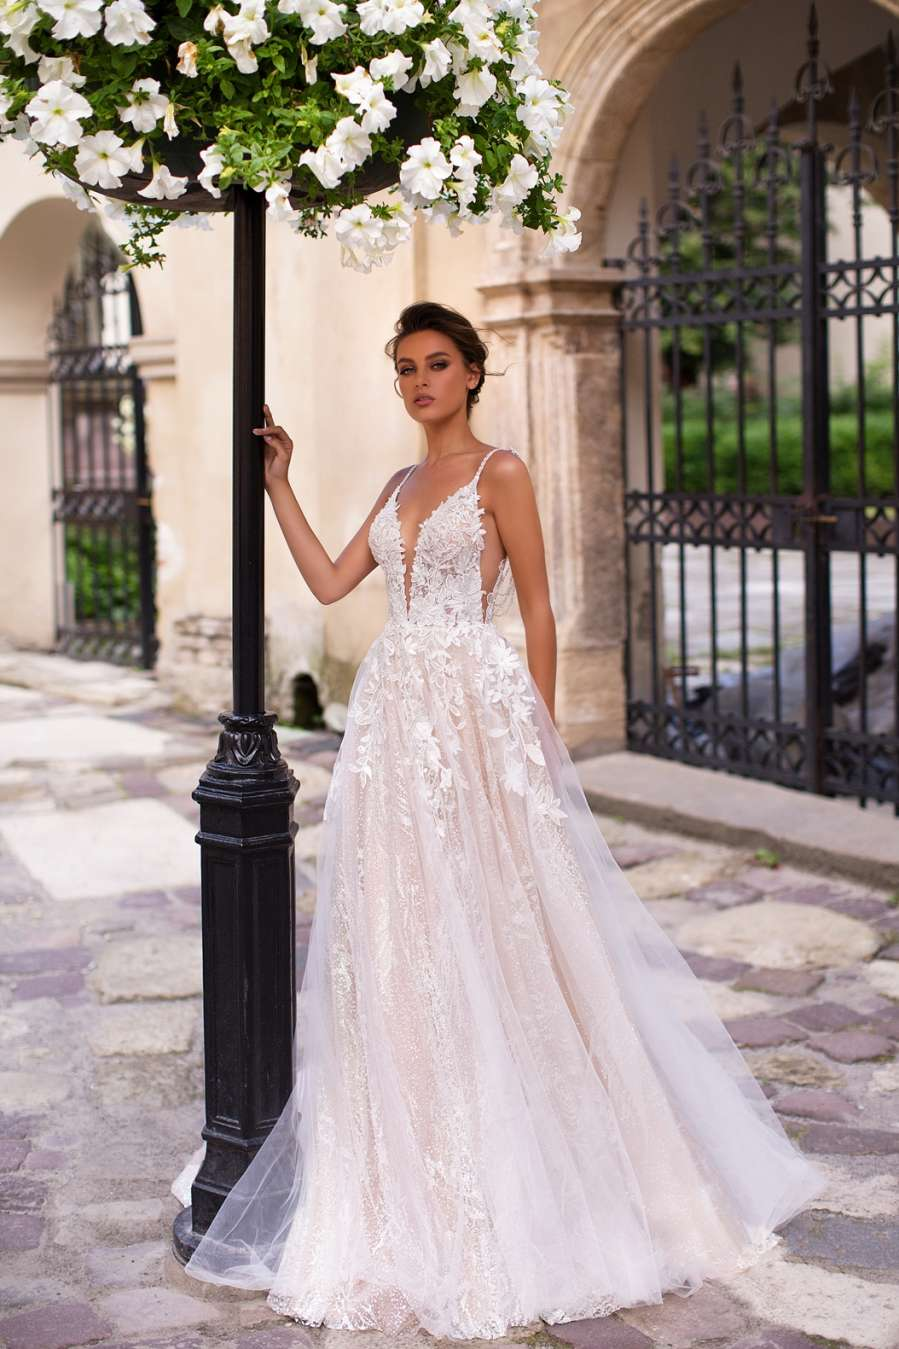 свадебное платье Liberica.900x900w